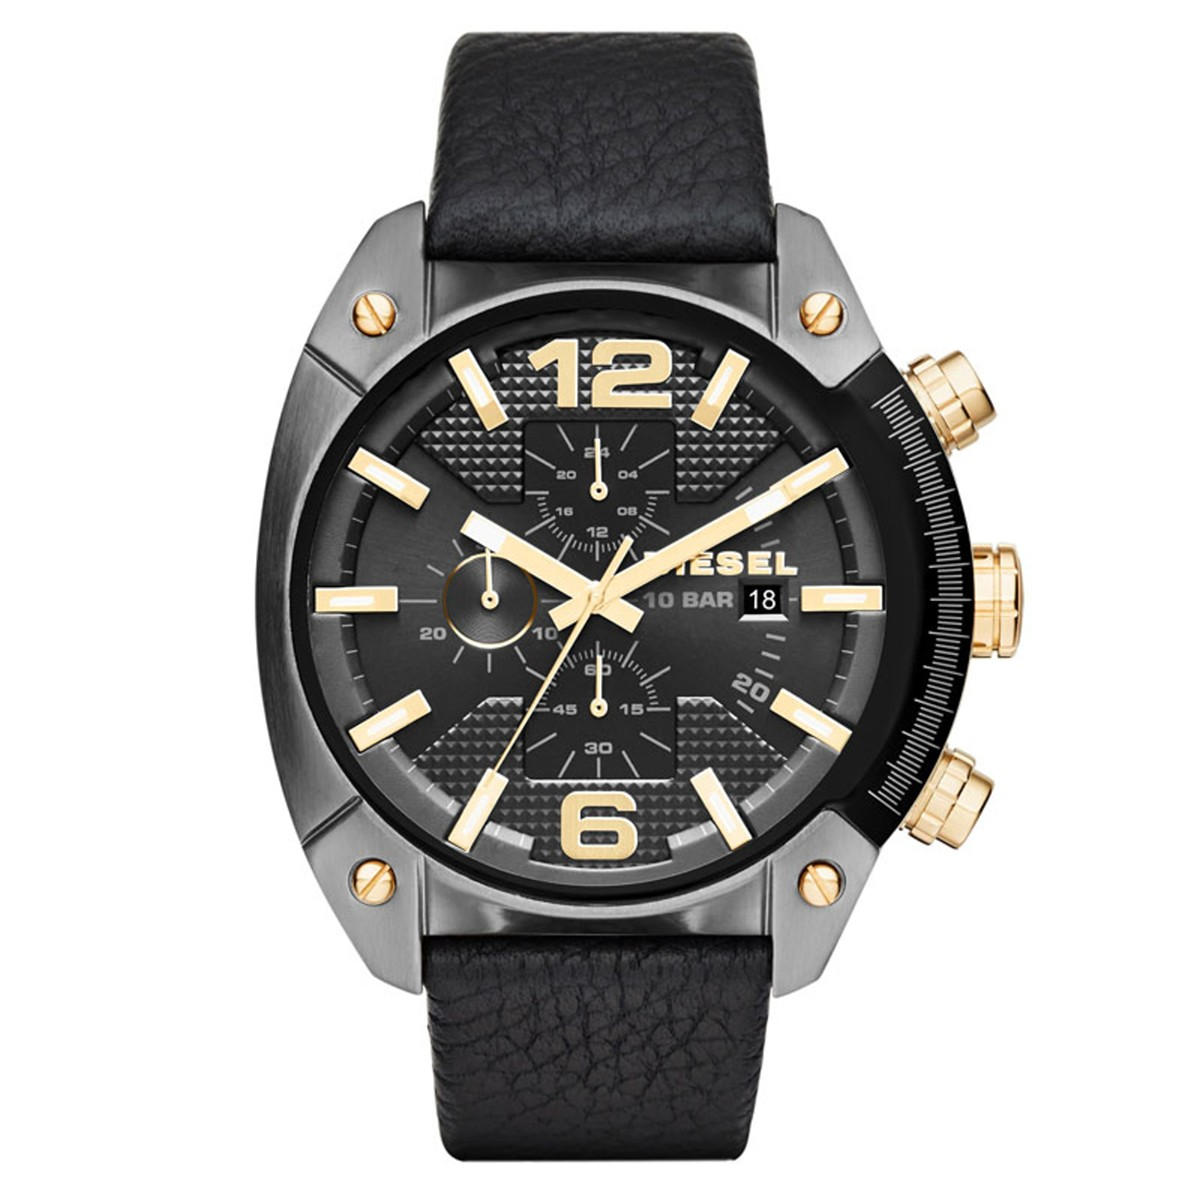 60a080f98e8 Relógio Masculino Analógico Diesel